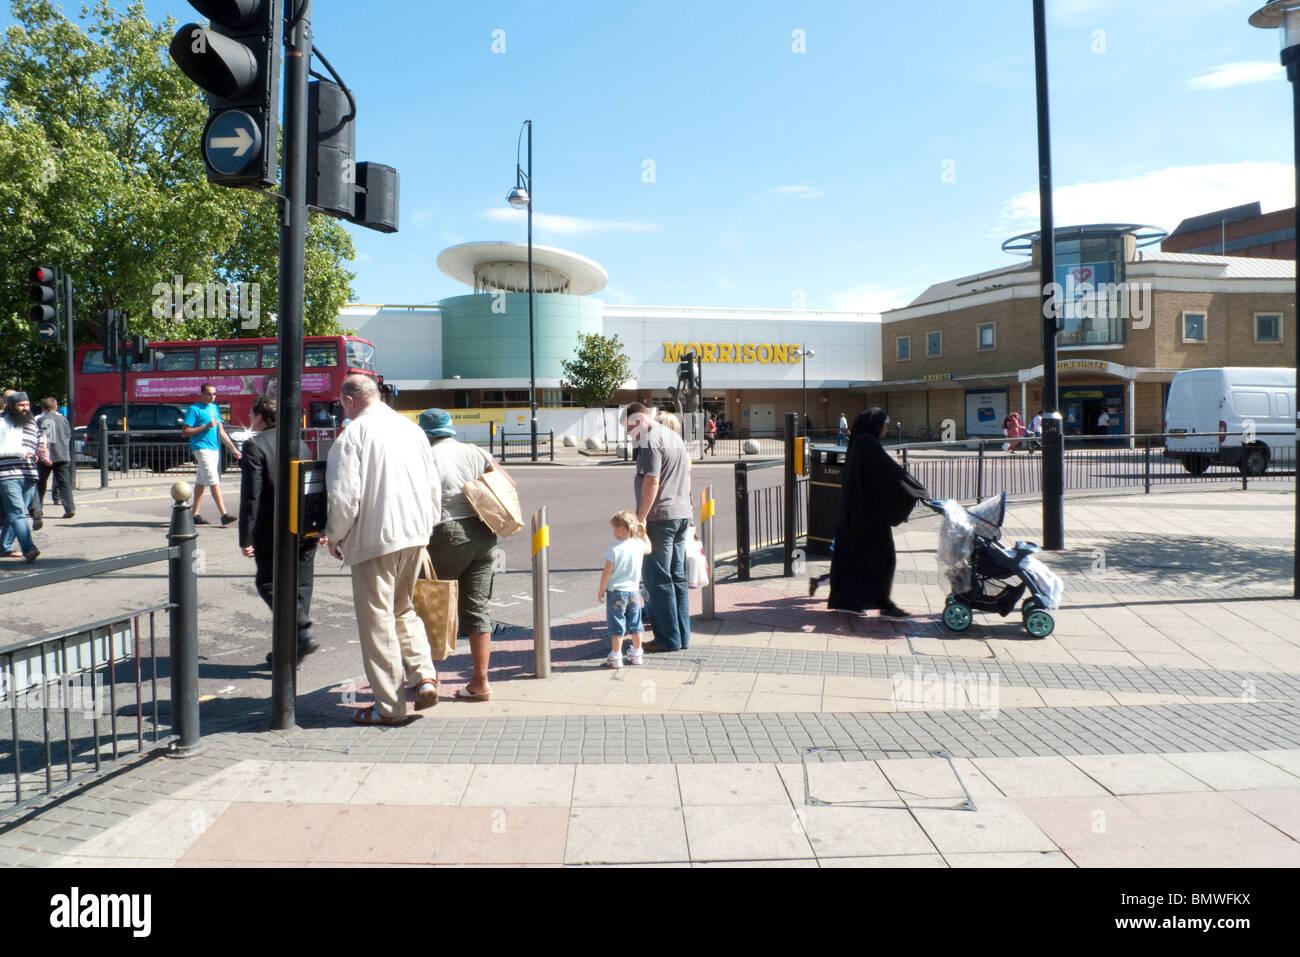 Pedestrians crossing street at traffic lights near Morrisons supermarket Stratford East London England UK - Stock Image